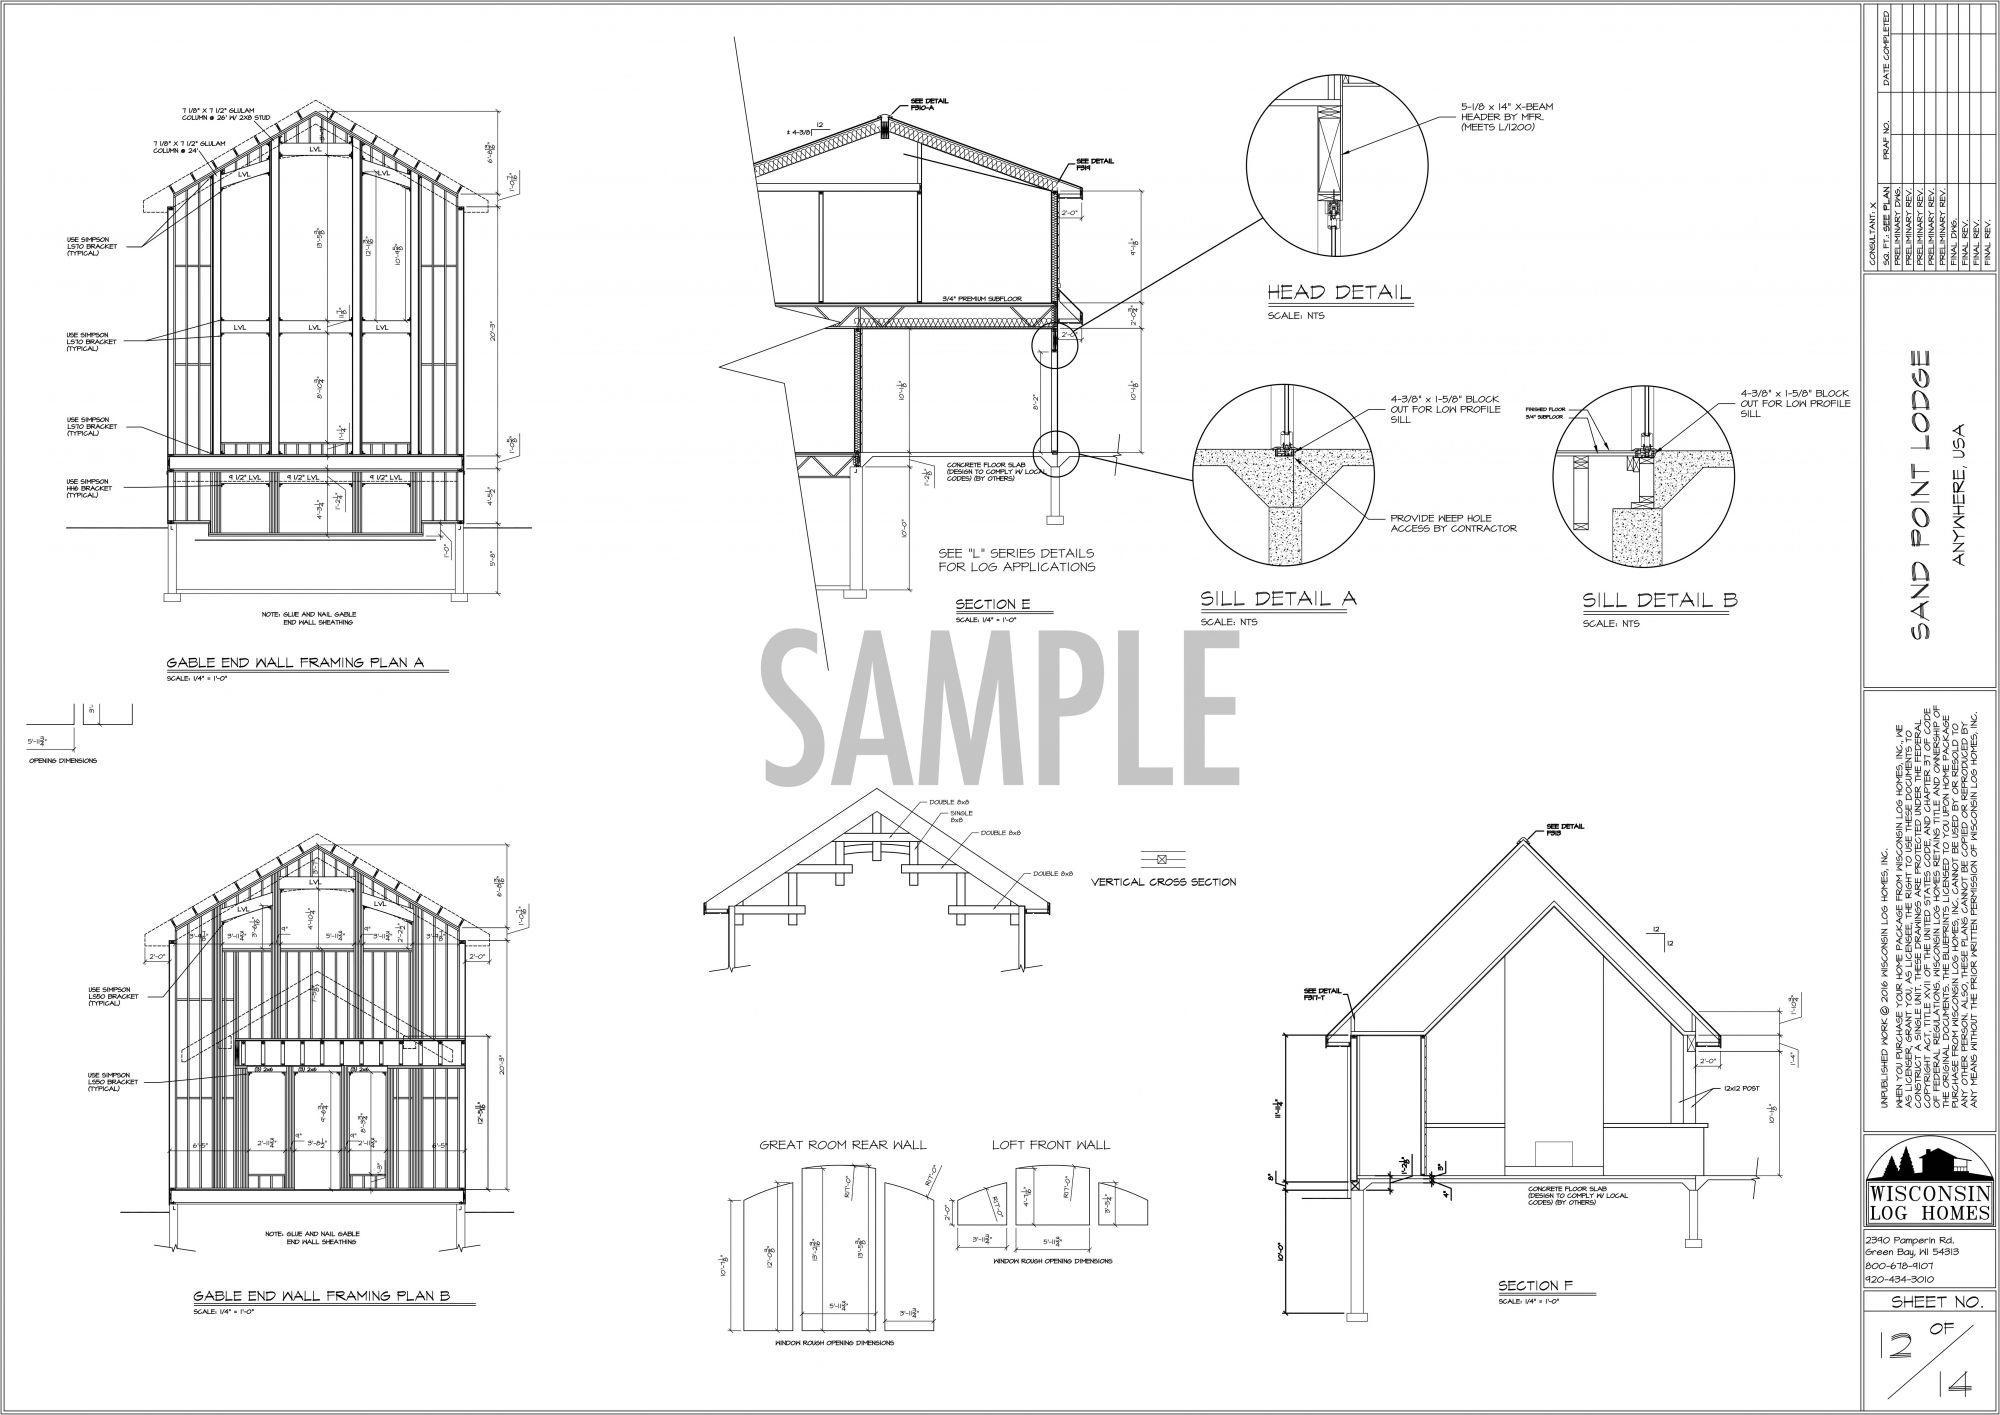 Copyright Wisconsin Log Homes